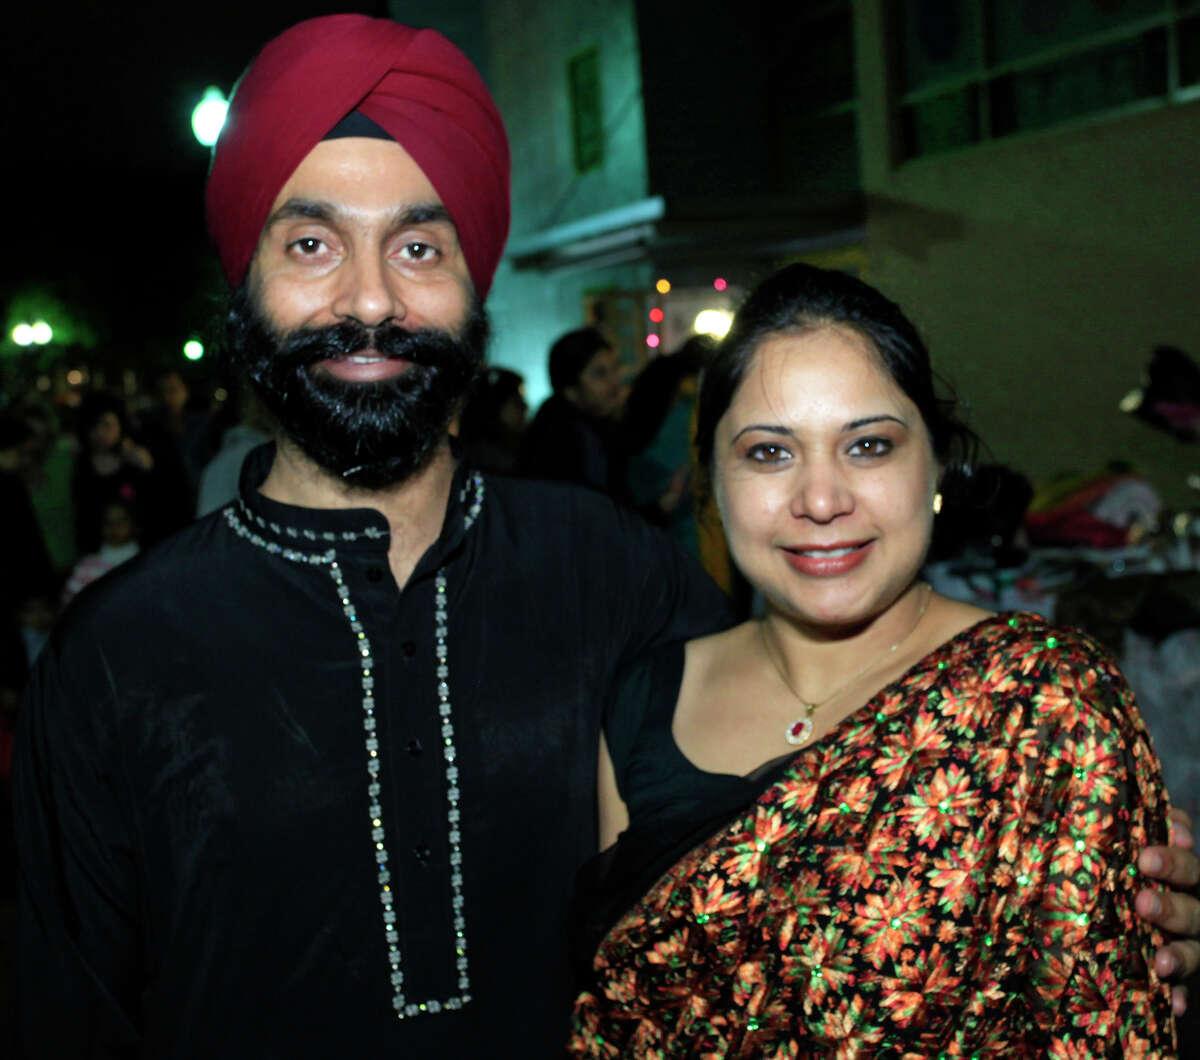 Harvinder Singh and wife Neelu Kaur at Diwali, the Festival of Lights, Saturday, Nov. 5, 2011, at HemisFair Park.